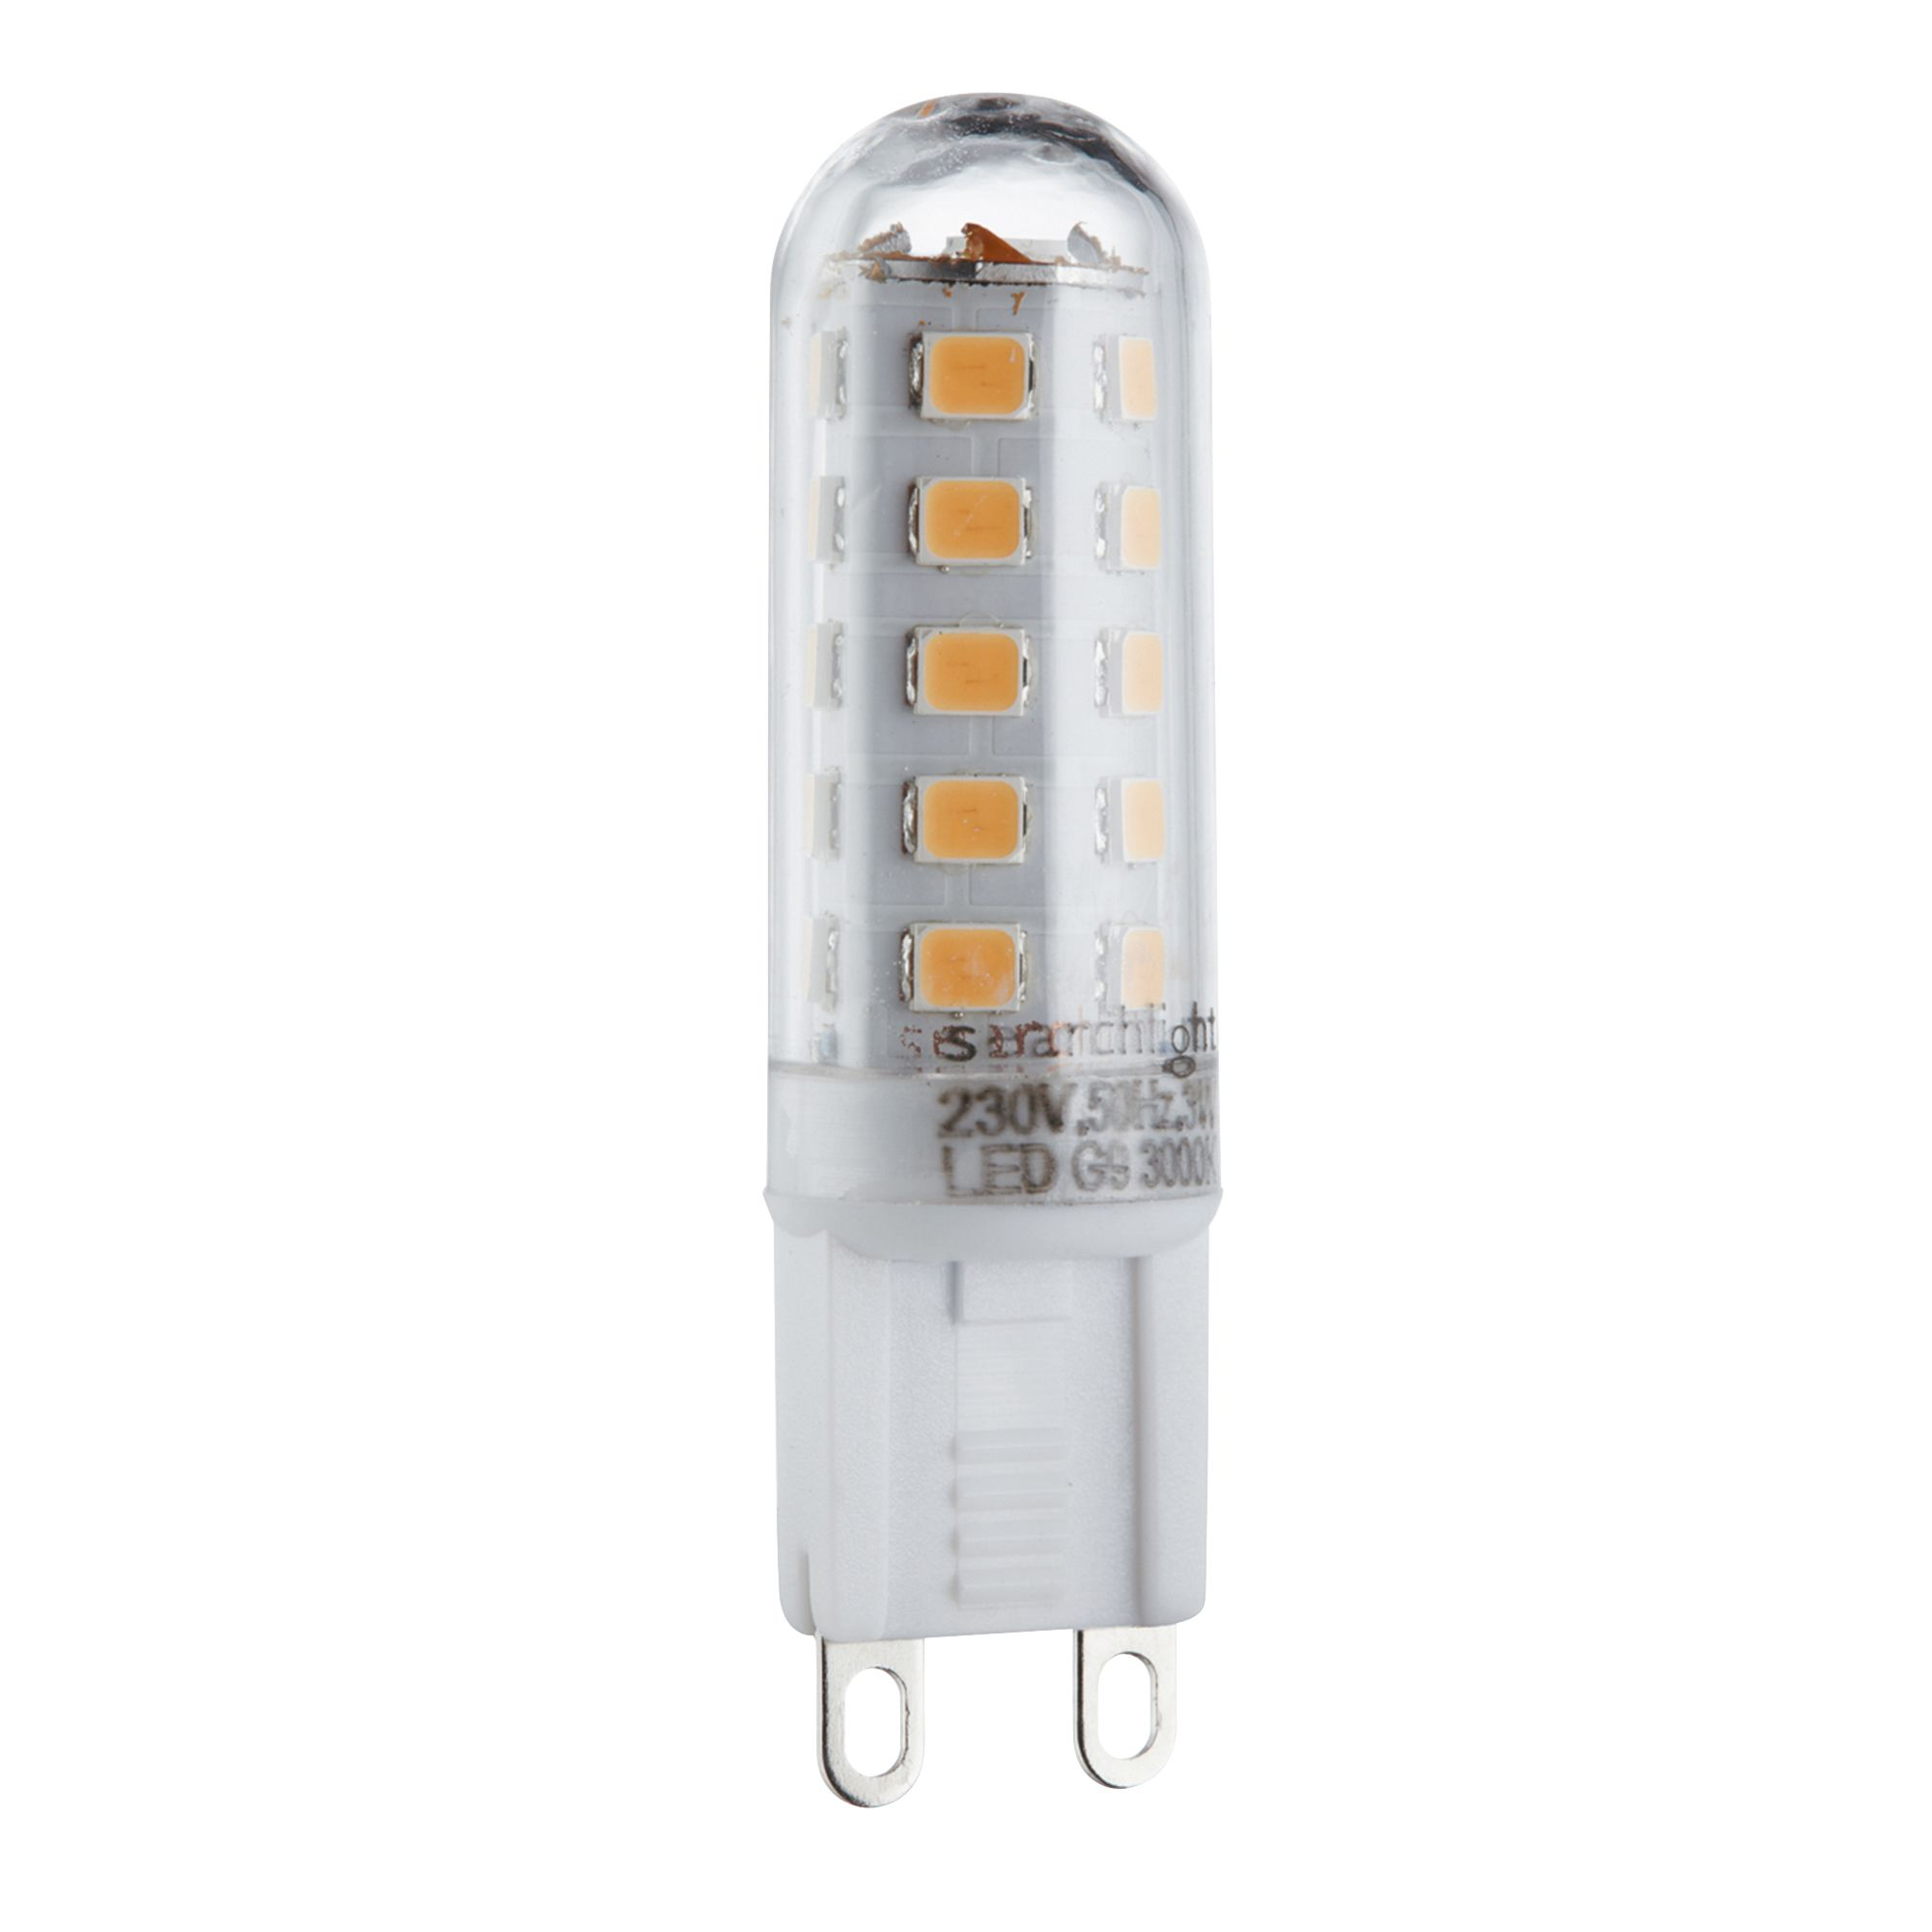 G9 Led Bulb - 3w, 300 Lumens, Cool White